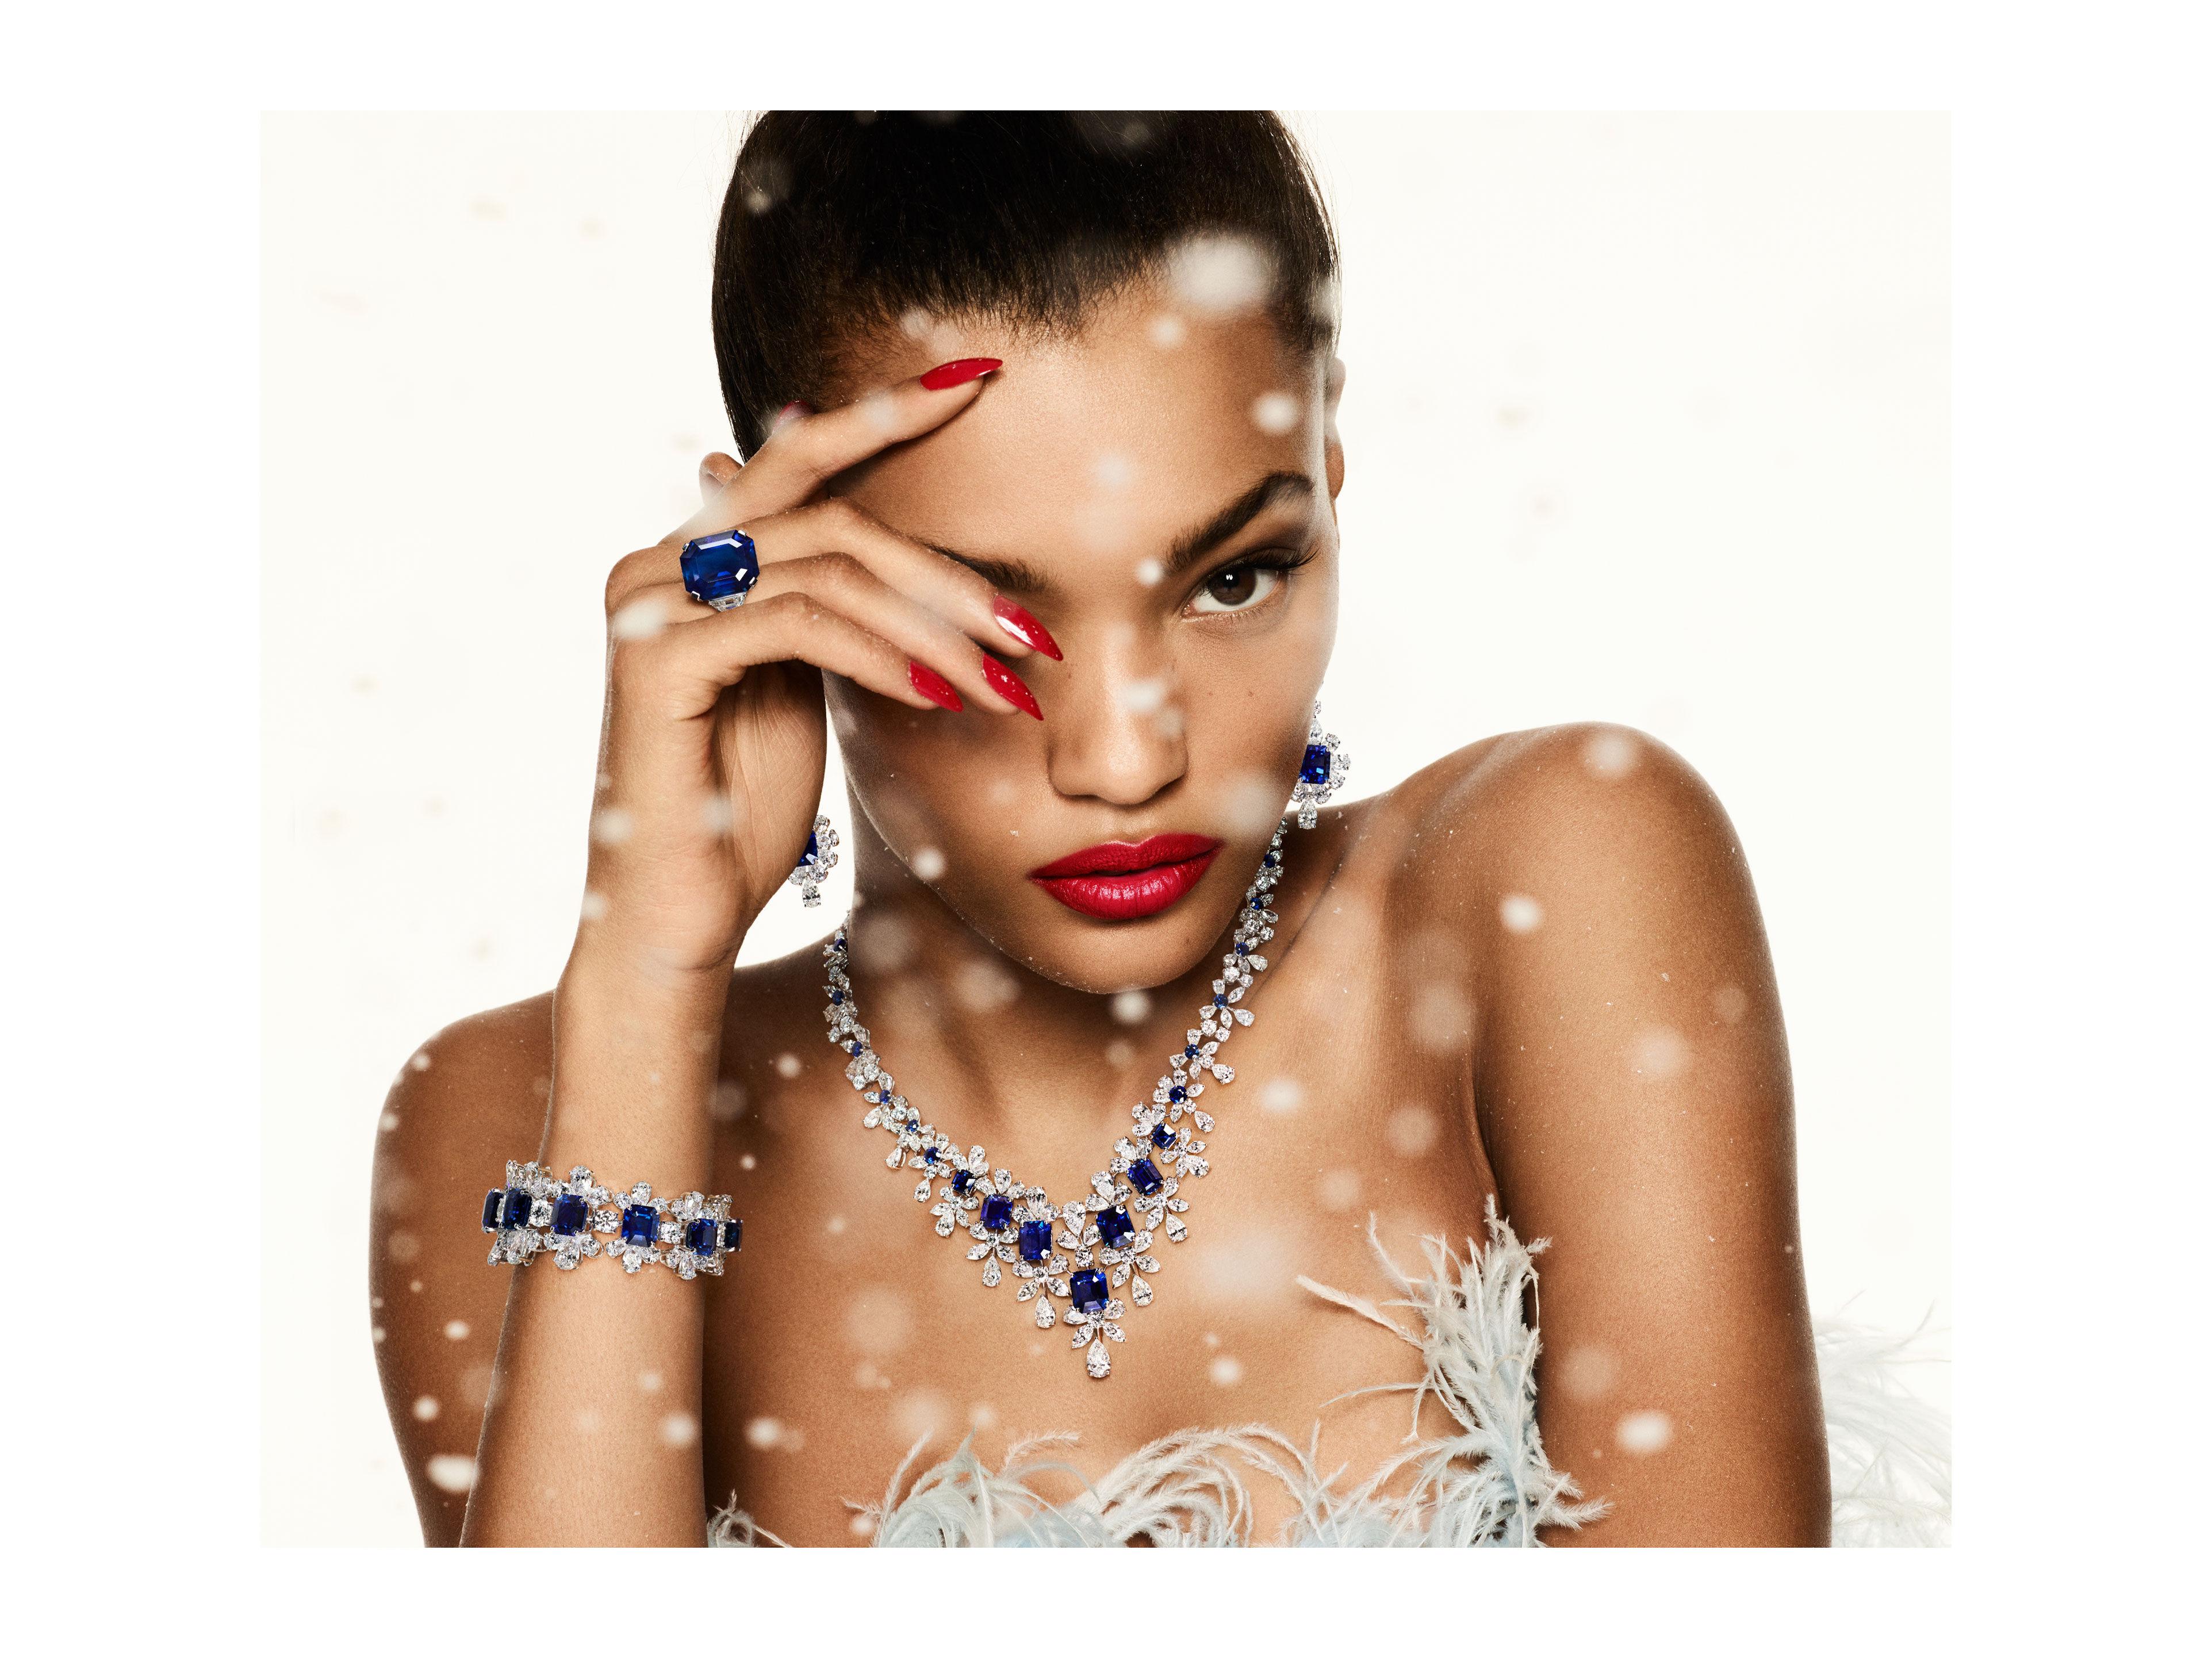 Model wears Graff sapphire and white diamond high jewellery